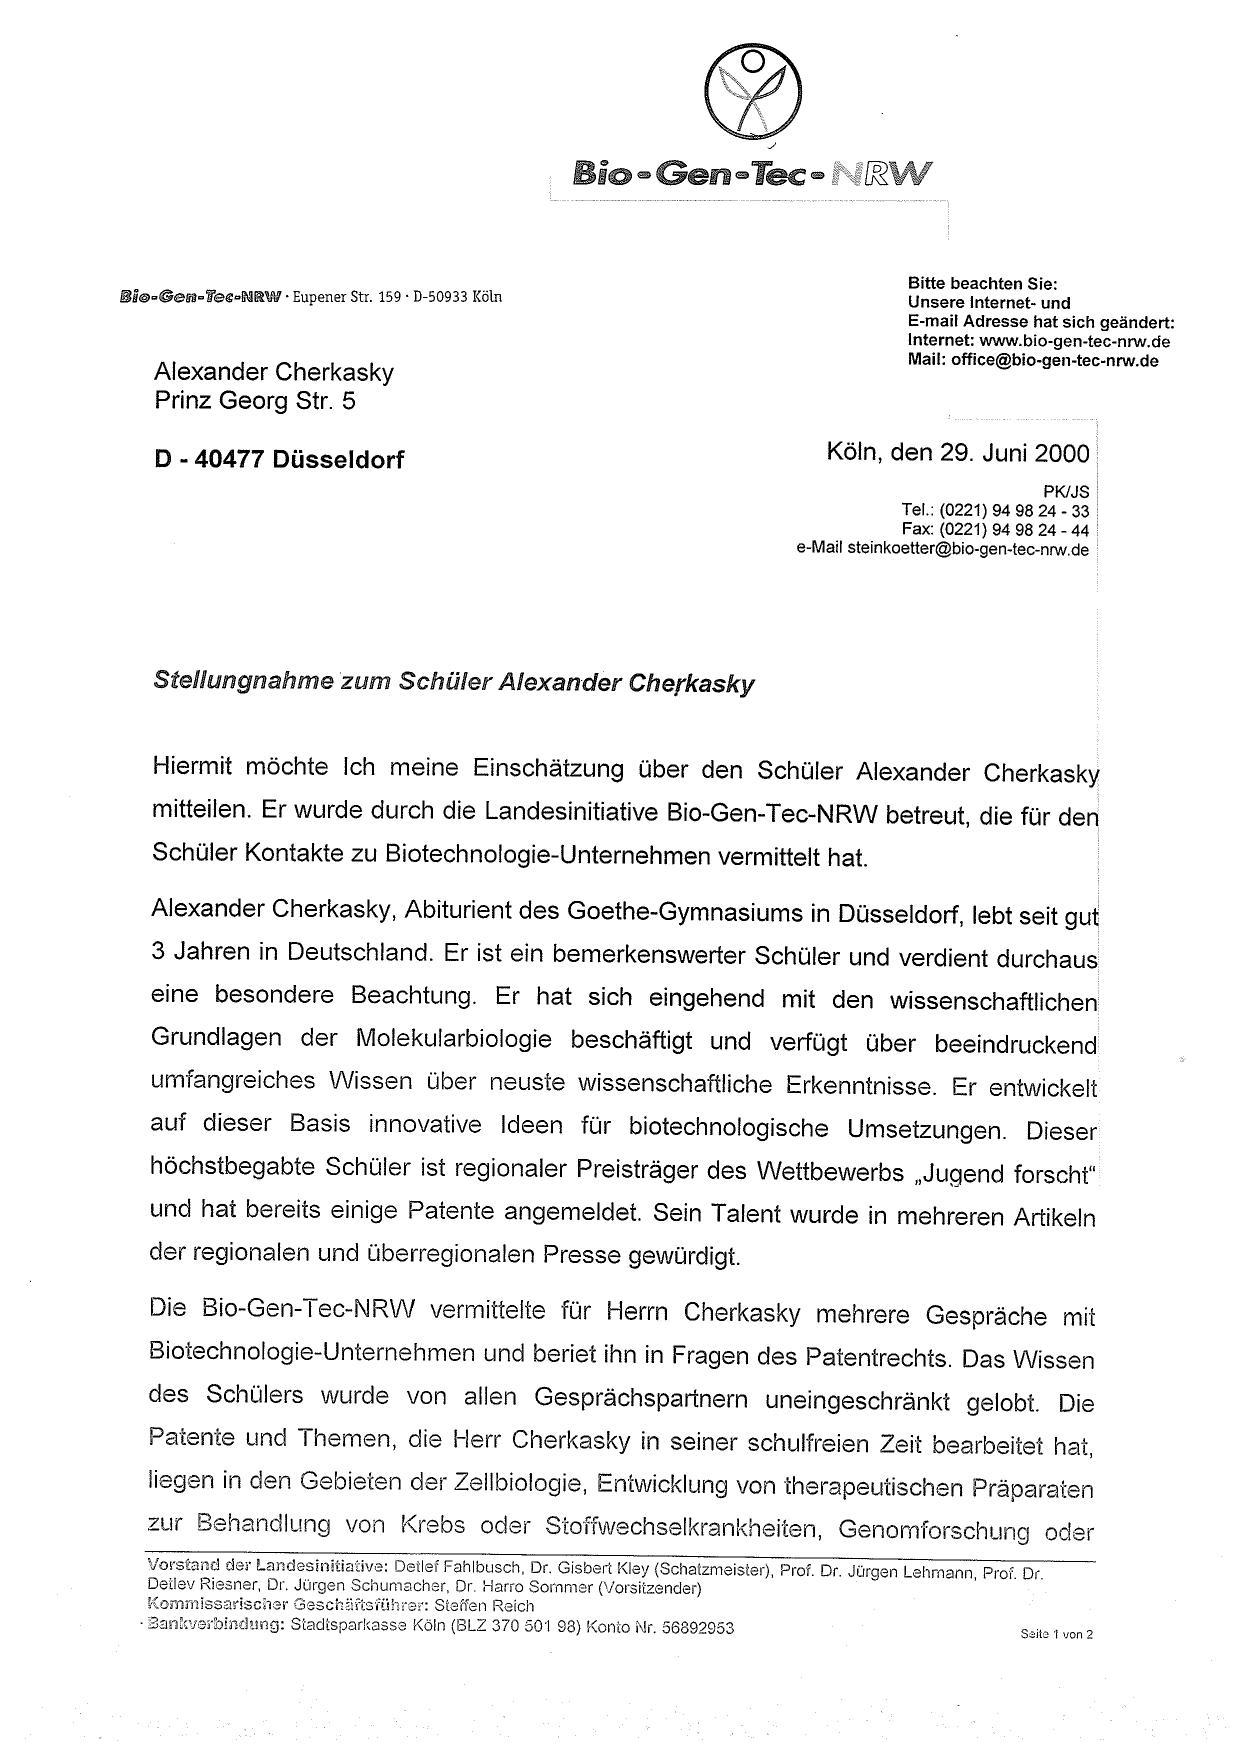 Resume Bio Gen Tech Nrw Ultrabiotech